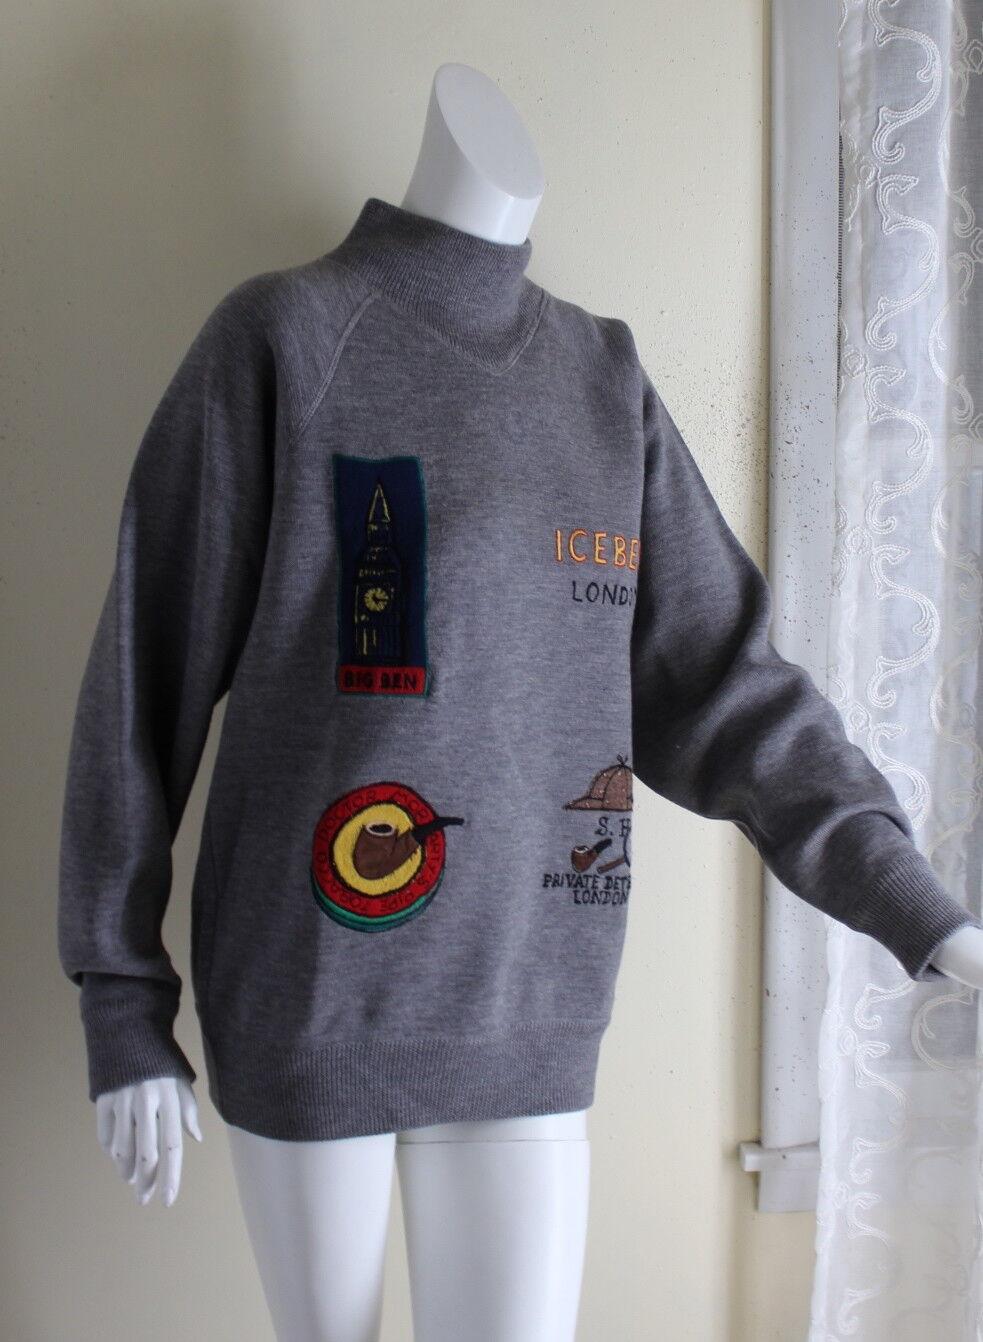 Iceberg London IV M L XL Big-Ben England Anglophile Detective Boutique Sweater